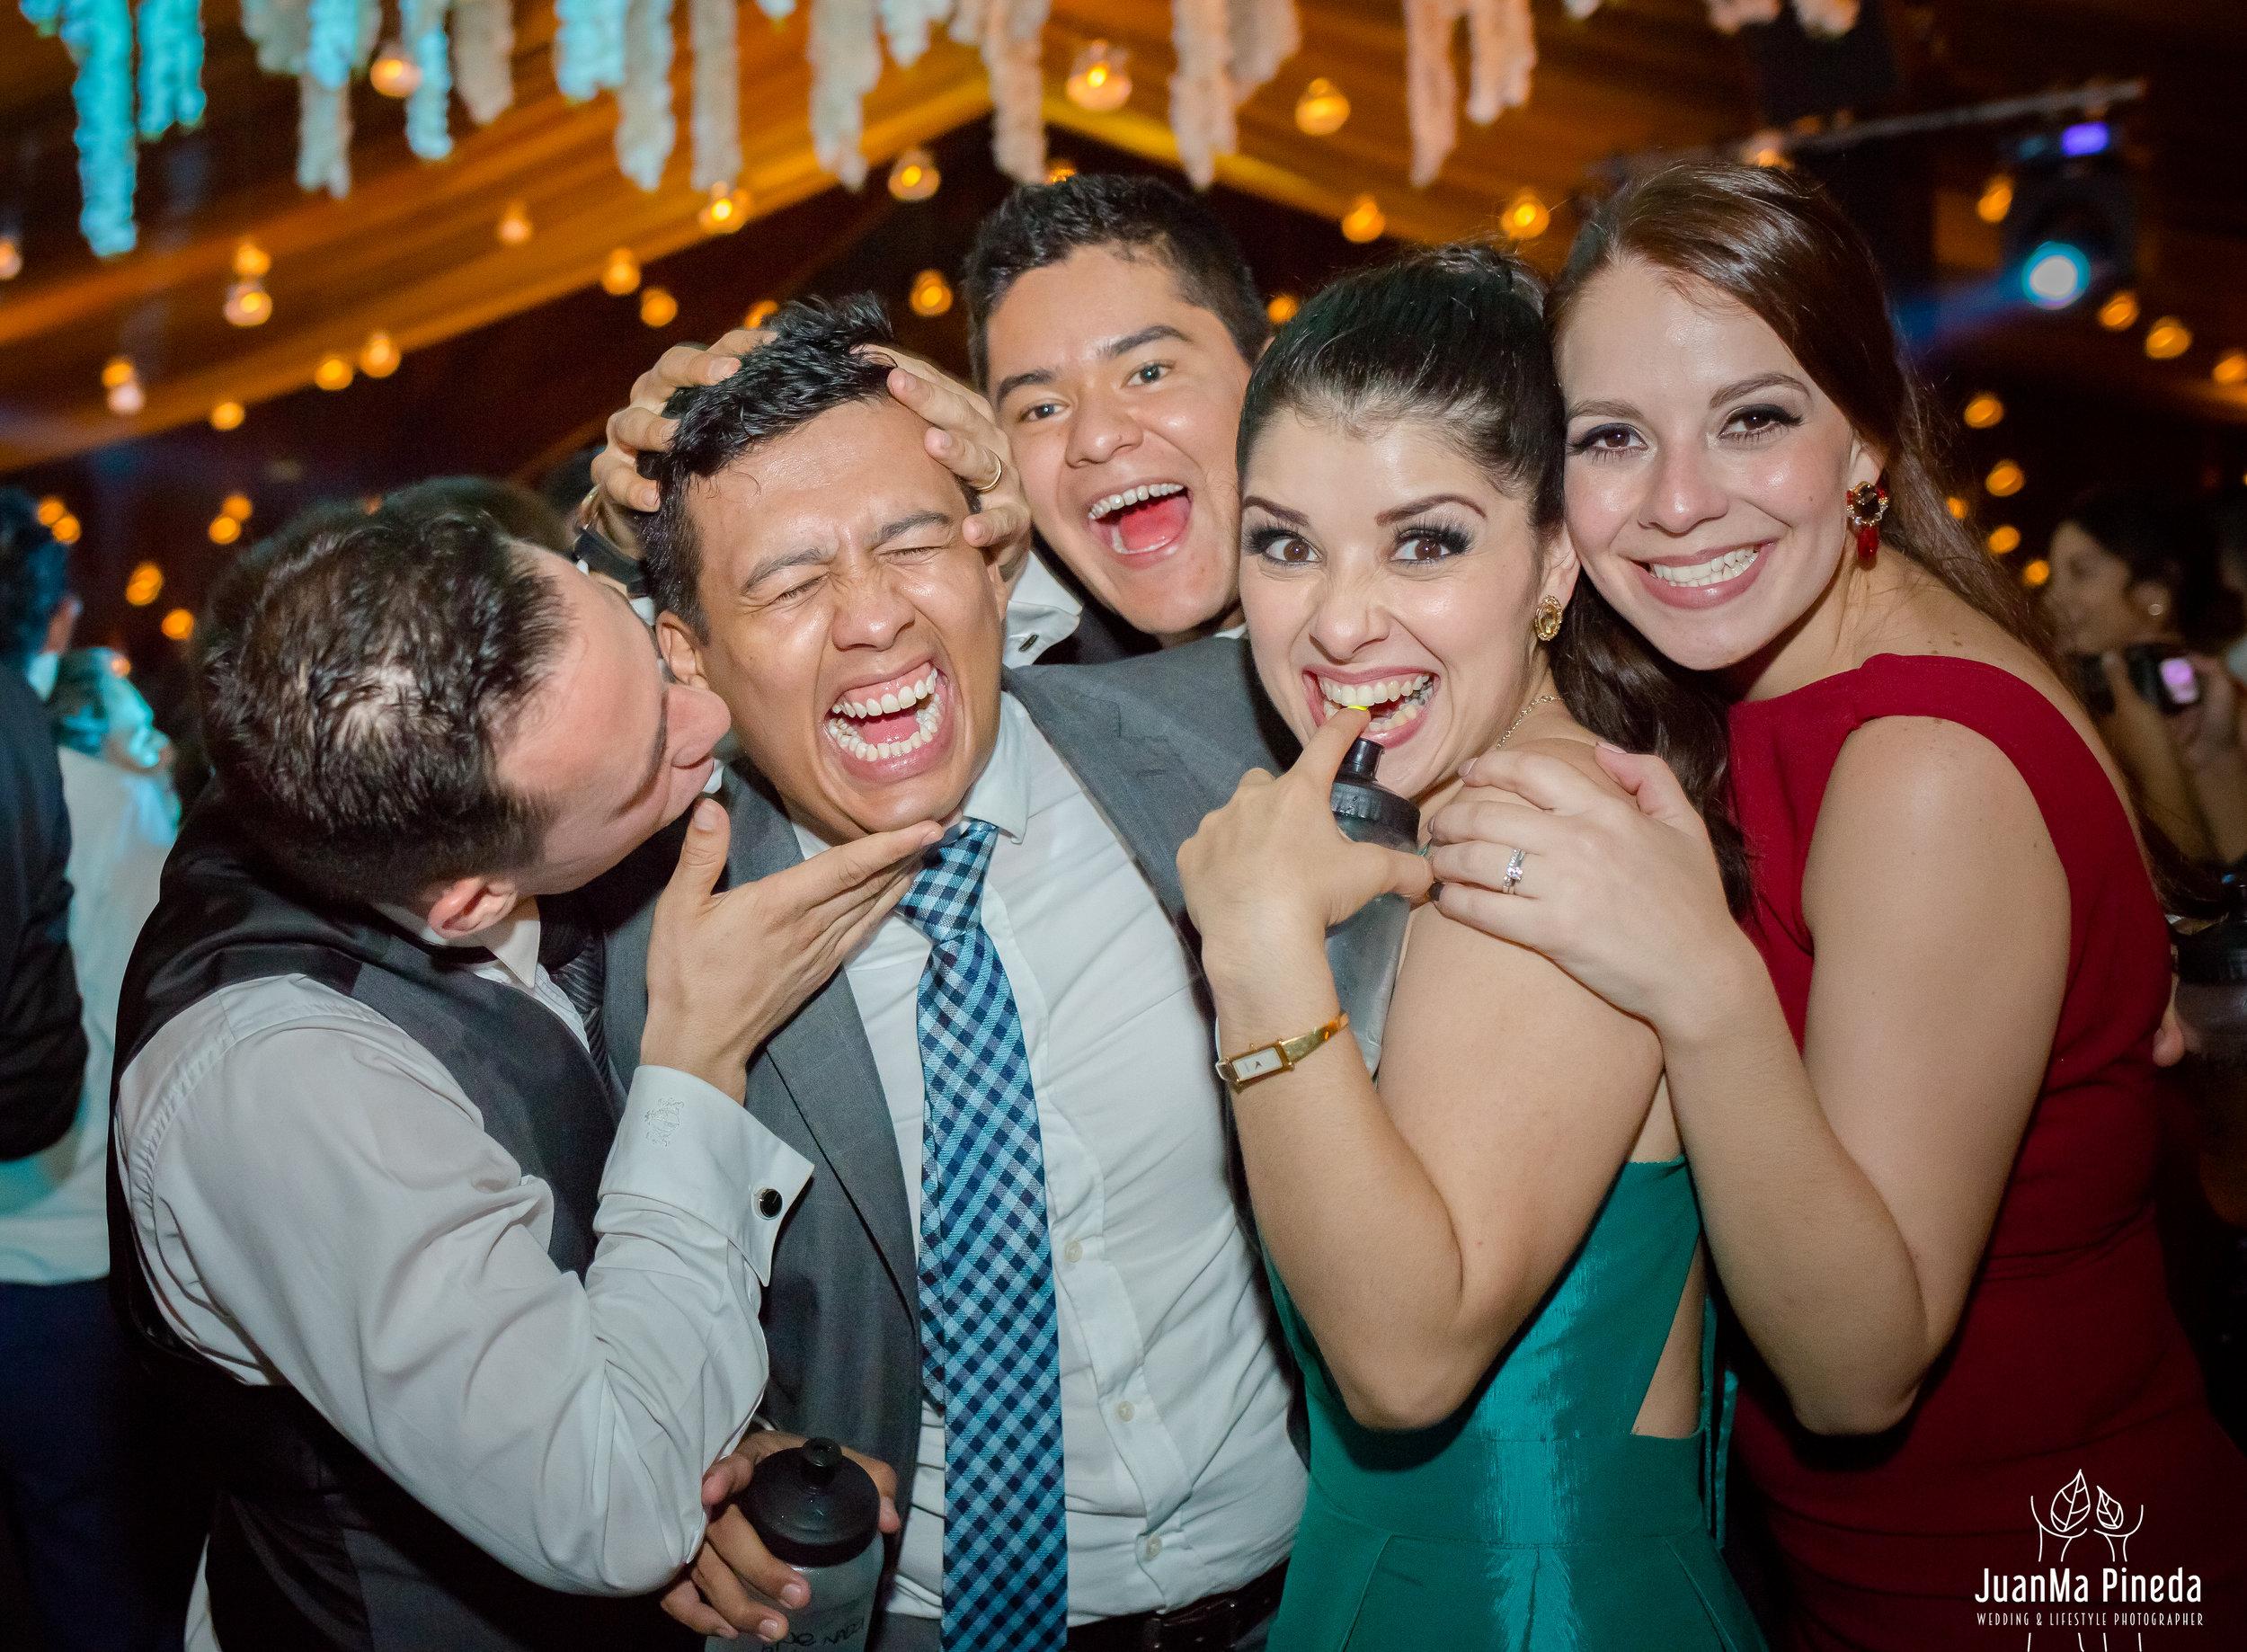 Wedding+Day+Photographer-1-7.jpg